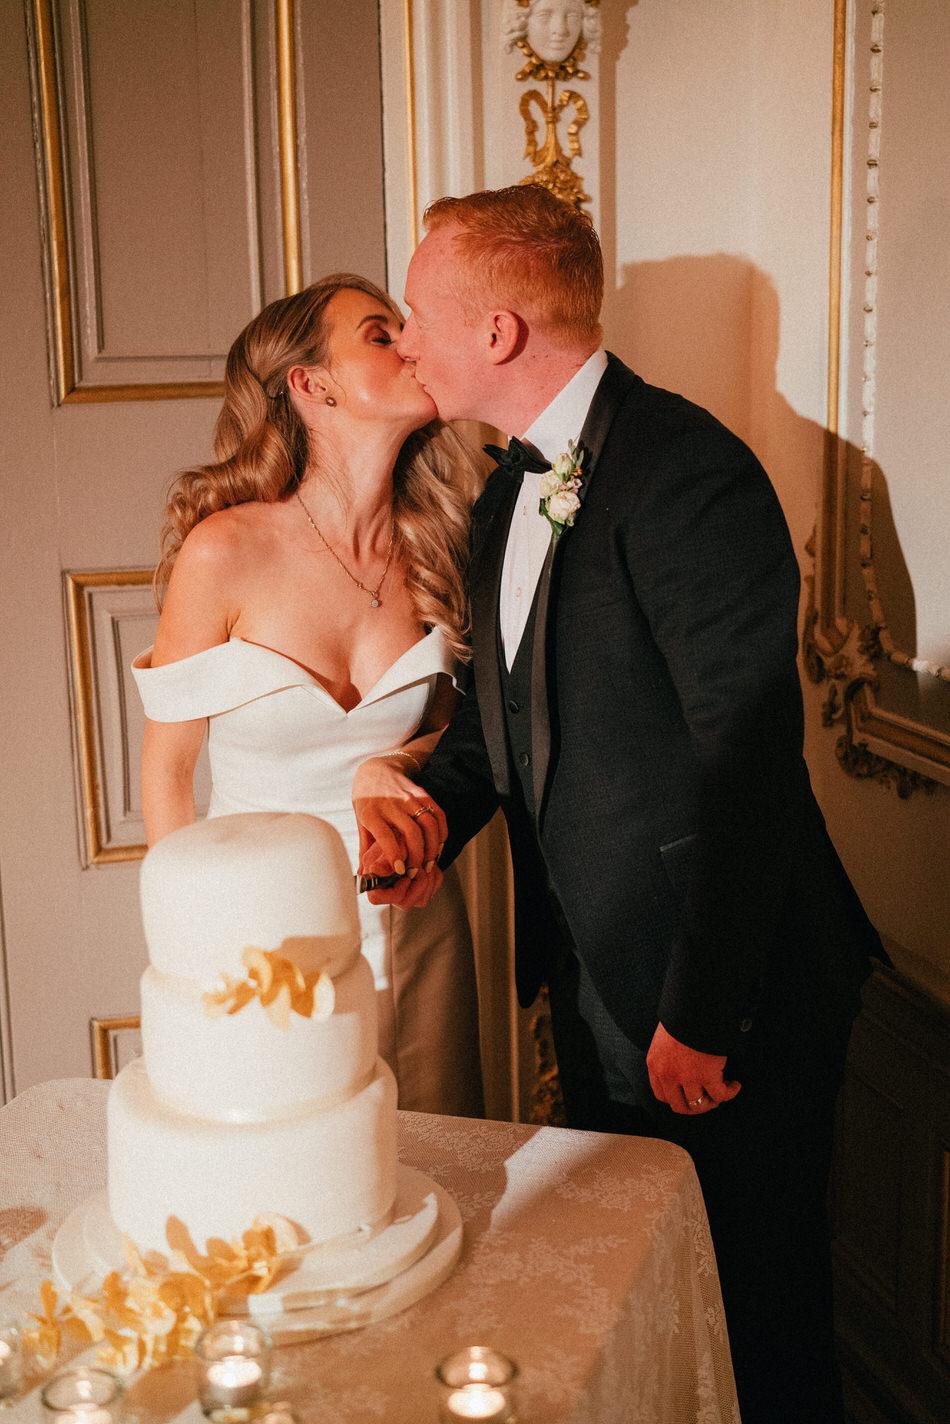 Castle-wedding-ireland-photos- 0318 233